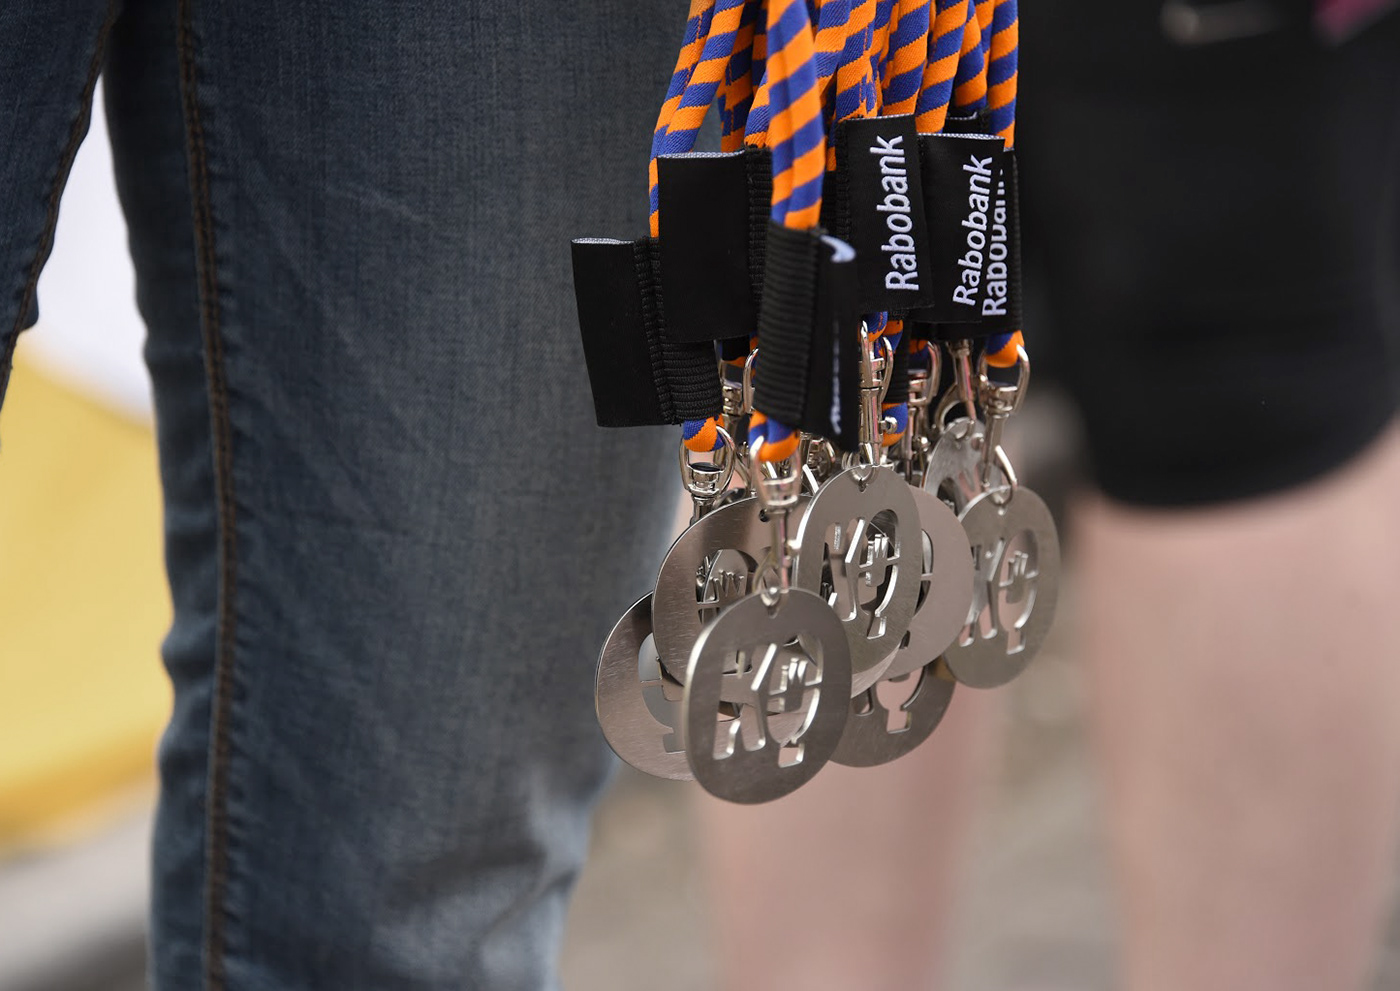 Bavaria Marathon sports running Duotone king queen athletic Koningsdag Nederland